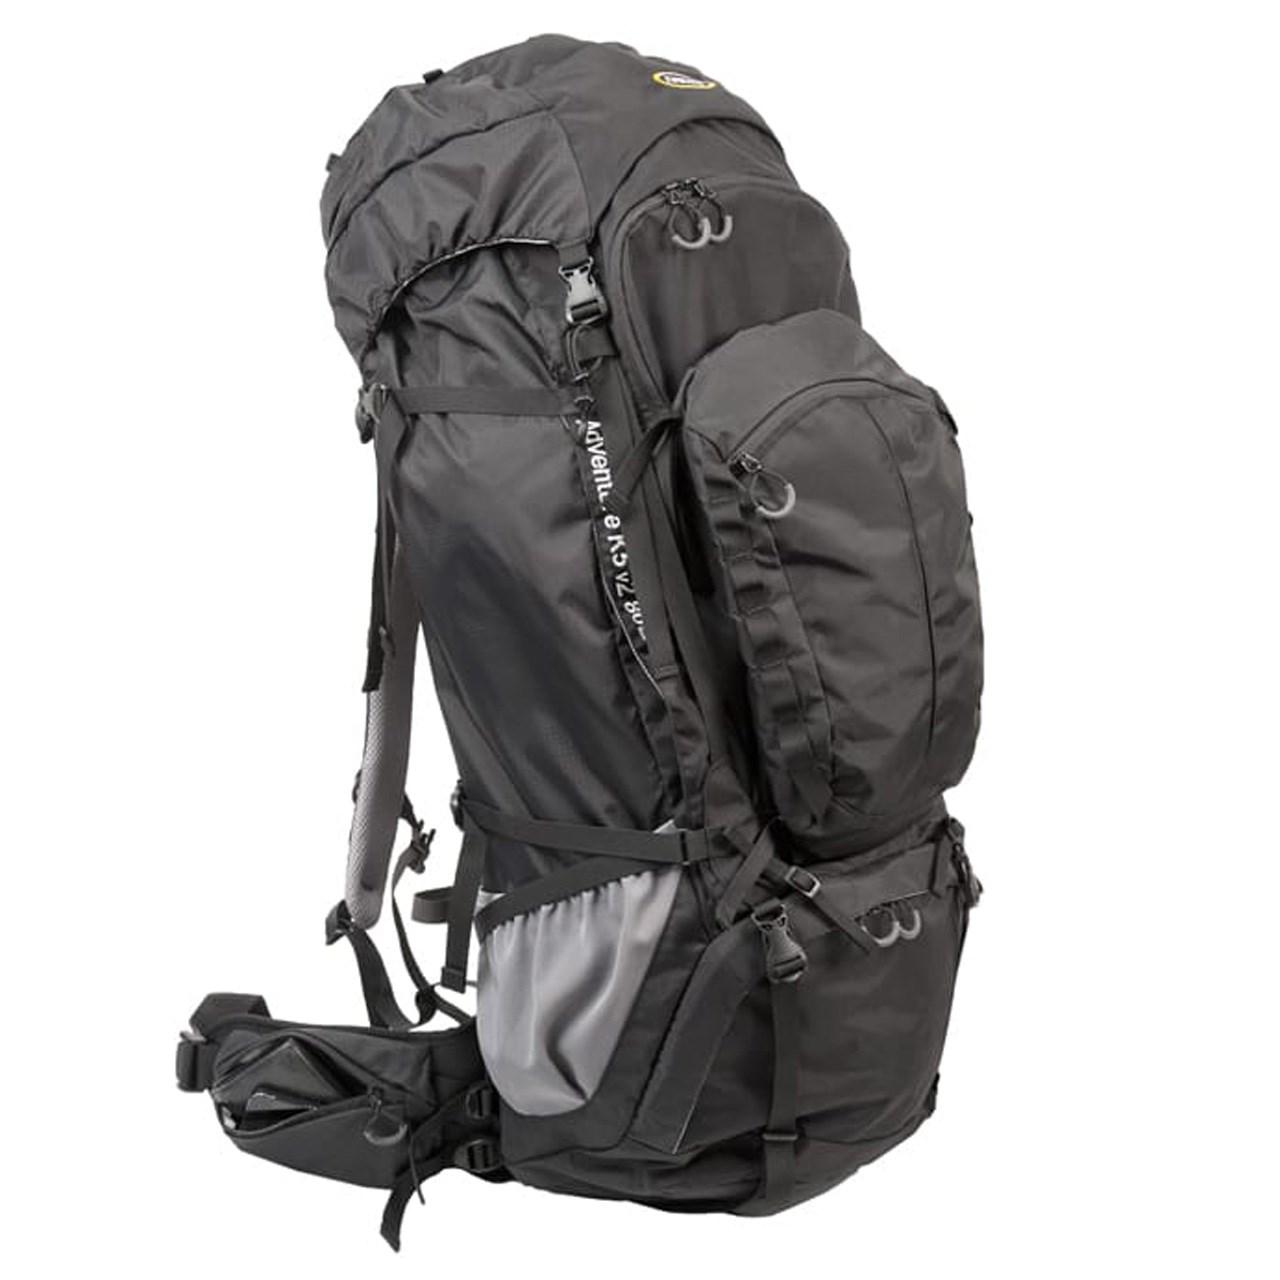 کوله پشتی کوهنوردی نانیو مدل K5v2